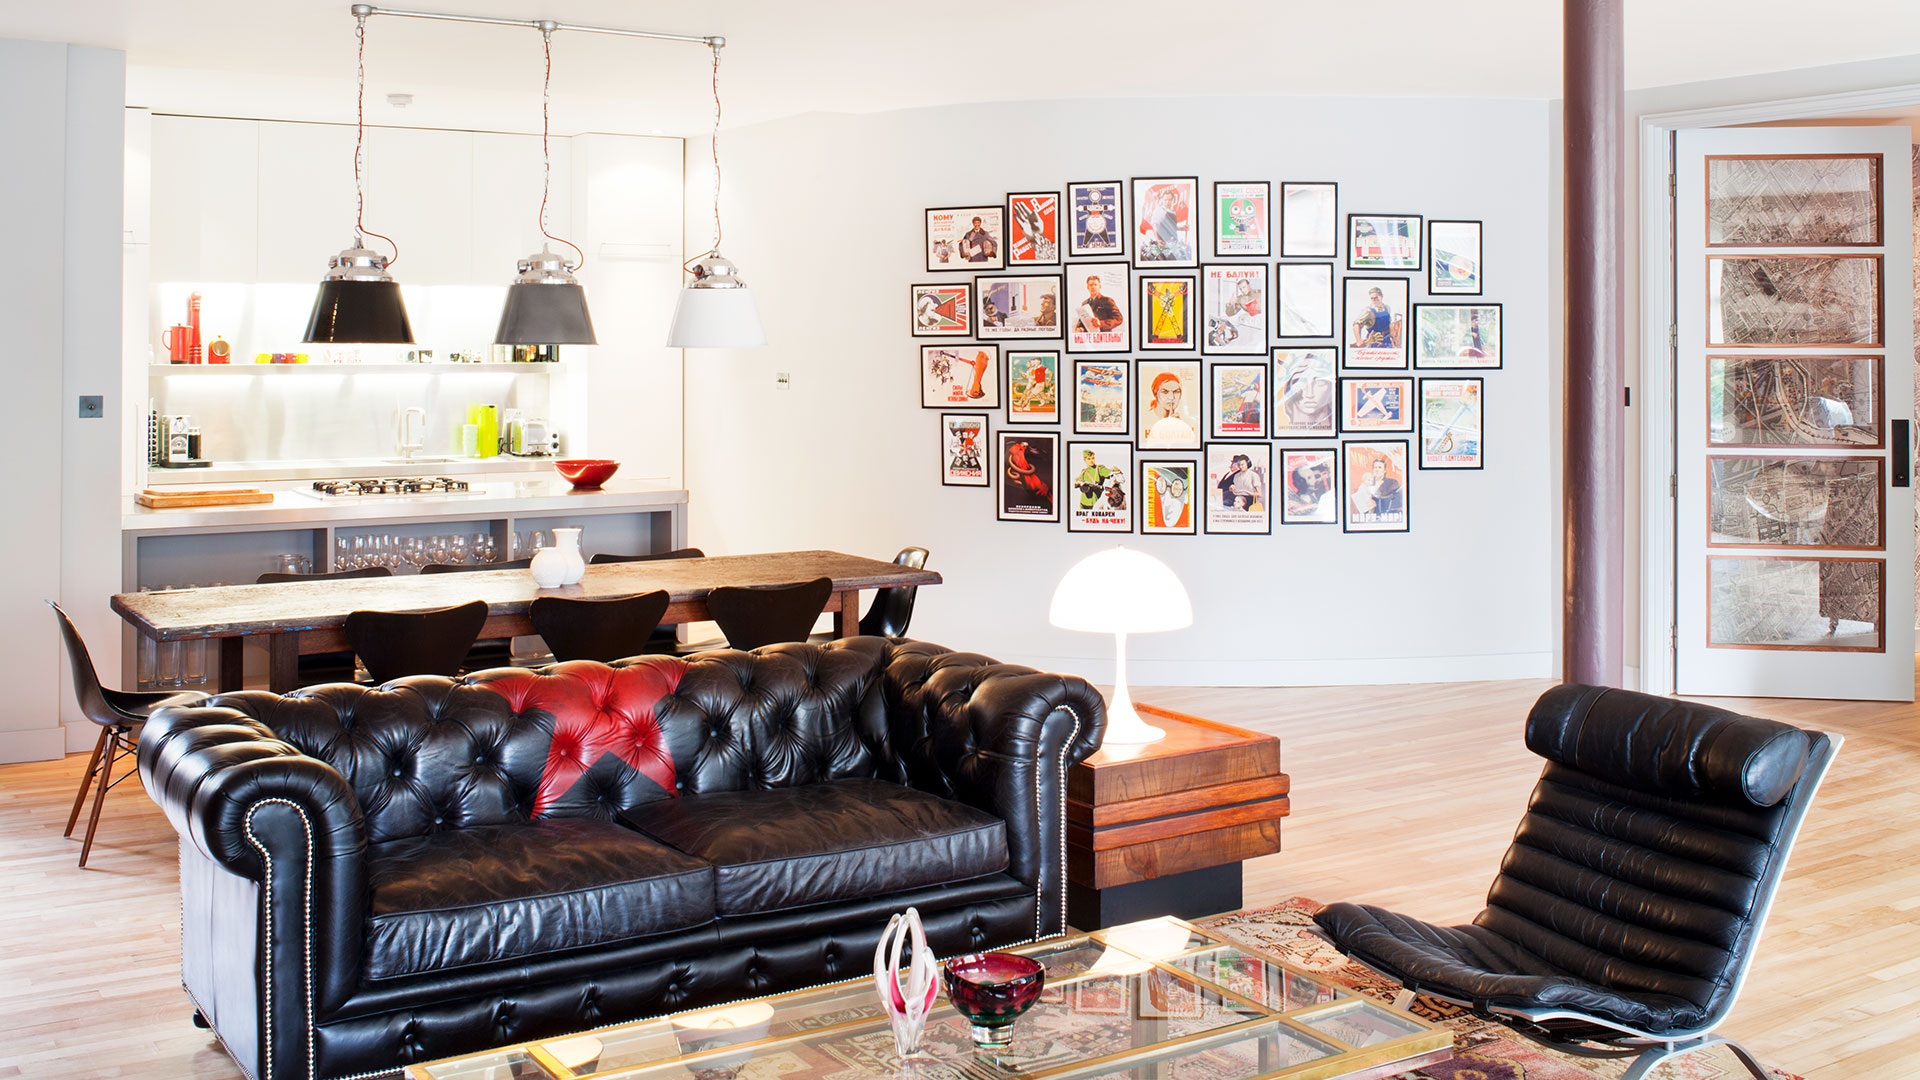 Bespoke Joinery | Audio Visual | Design | Security | Architect | Building Contractor | Design and Build | Construction | Interior Design | Building | Refurbishment | Cambridge | London | Suffolk | Essex | Saffron Walden | Hertfordshire | The Daniels Group